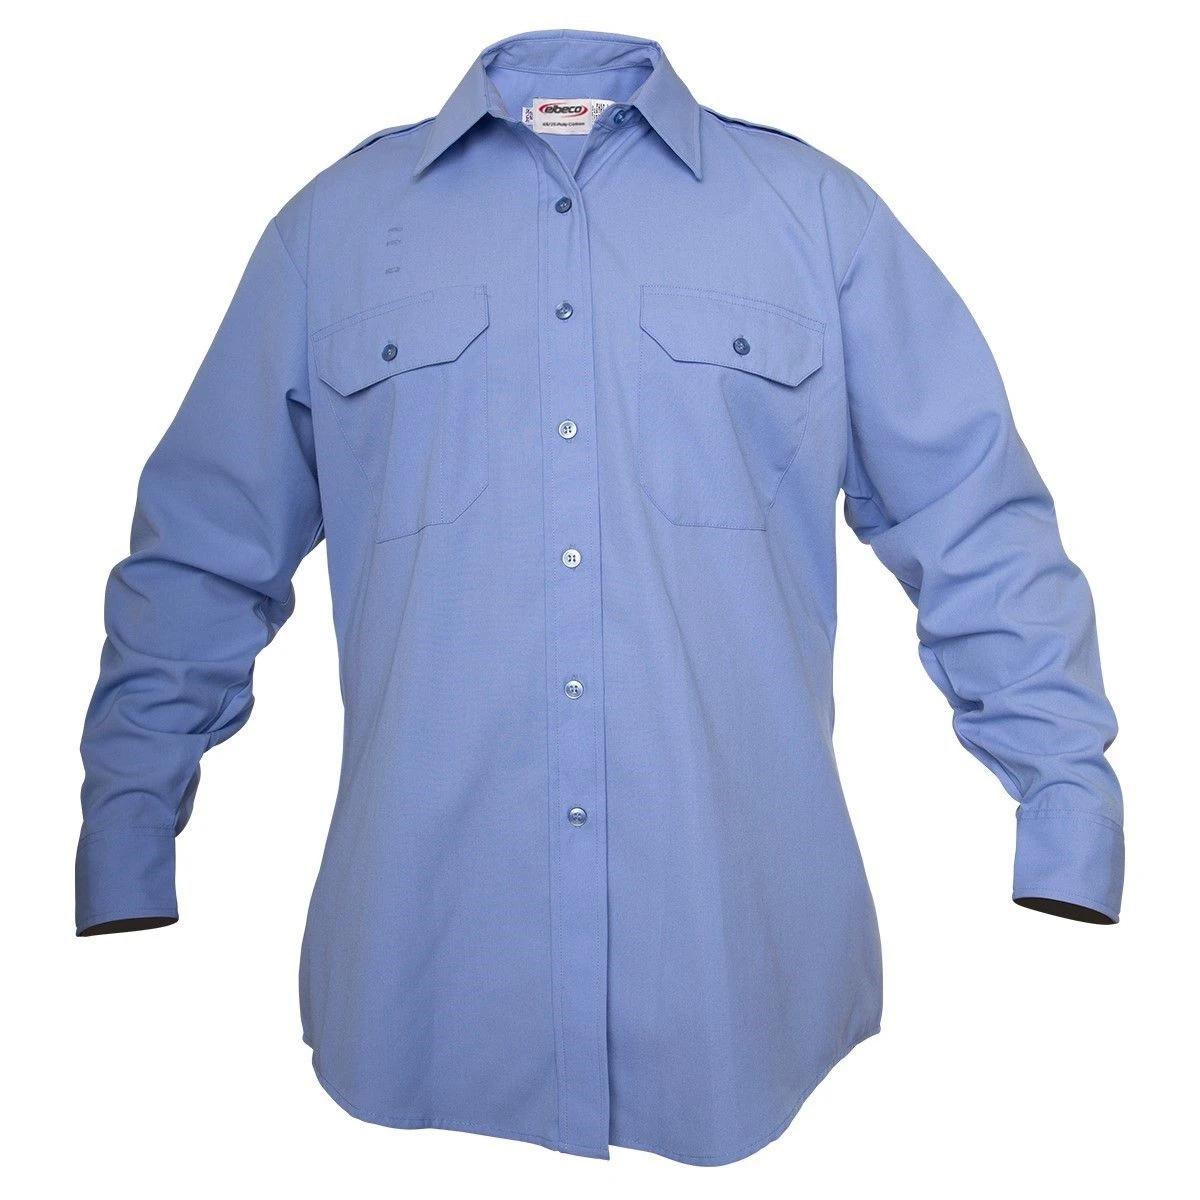 Elbeco Womens Long Sleeve First Responder Shirt